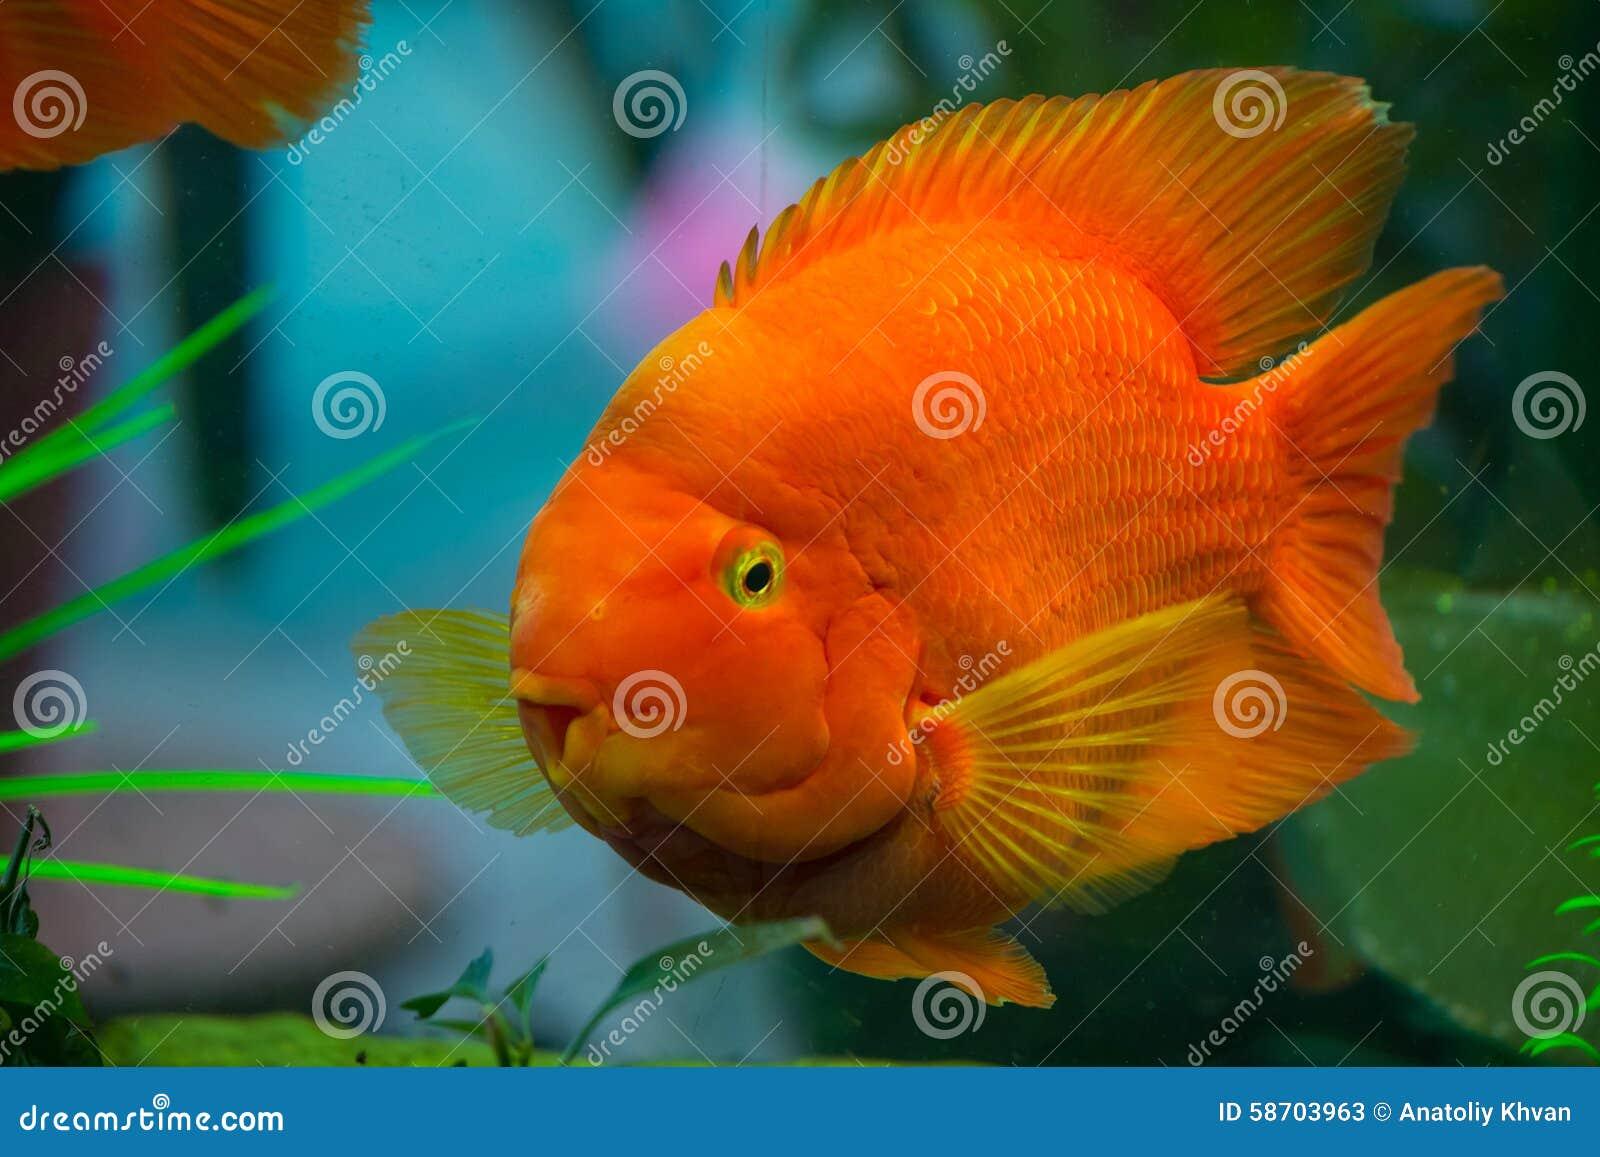 Parrot Fish In The Aquarium Stock Image - Image of water ...